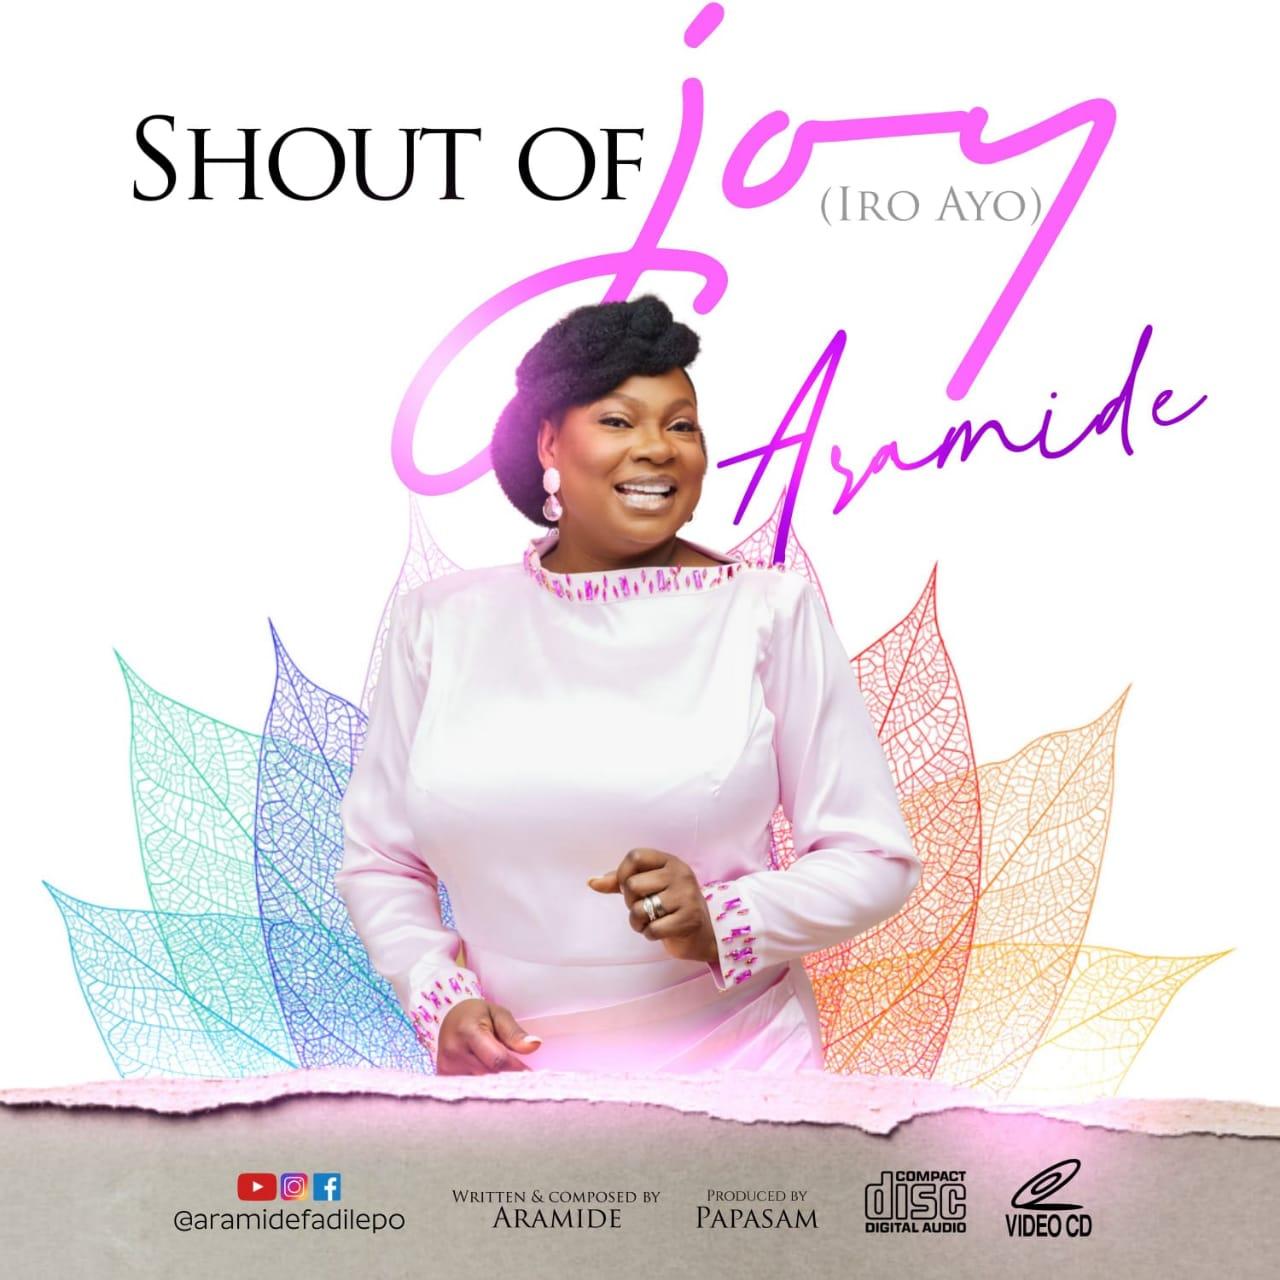 Shout of Joy – Aramide